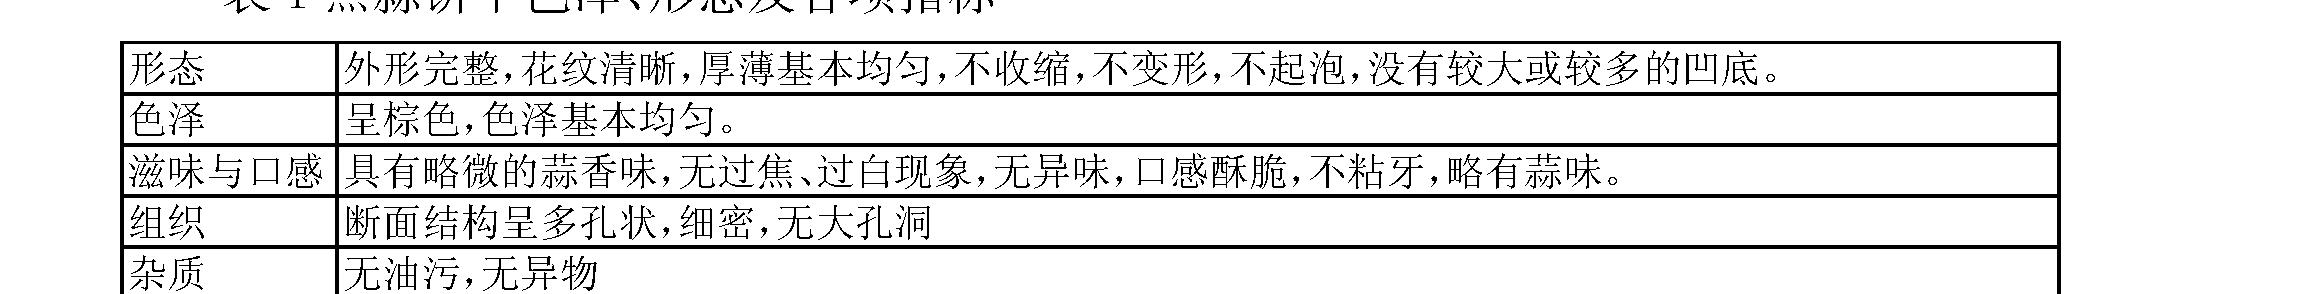 Figure CN103404577AD00041